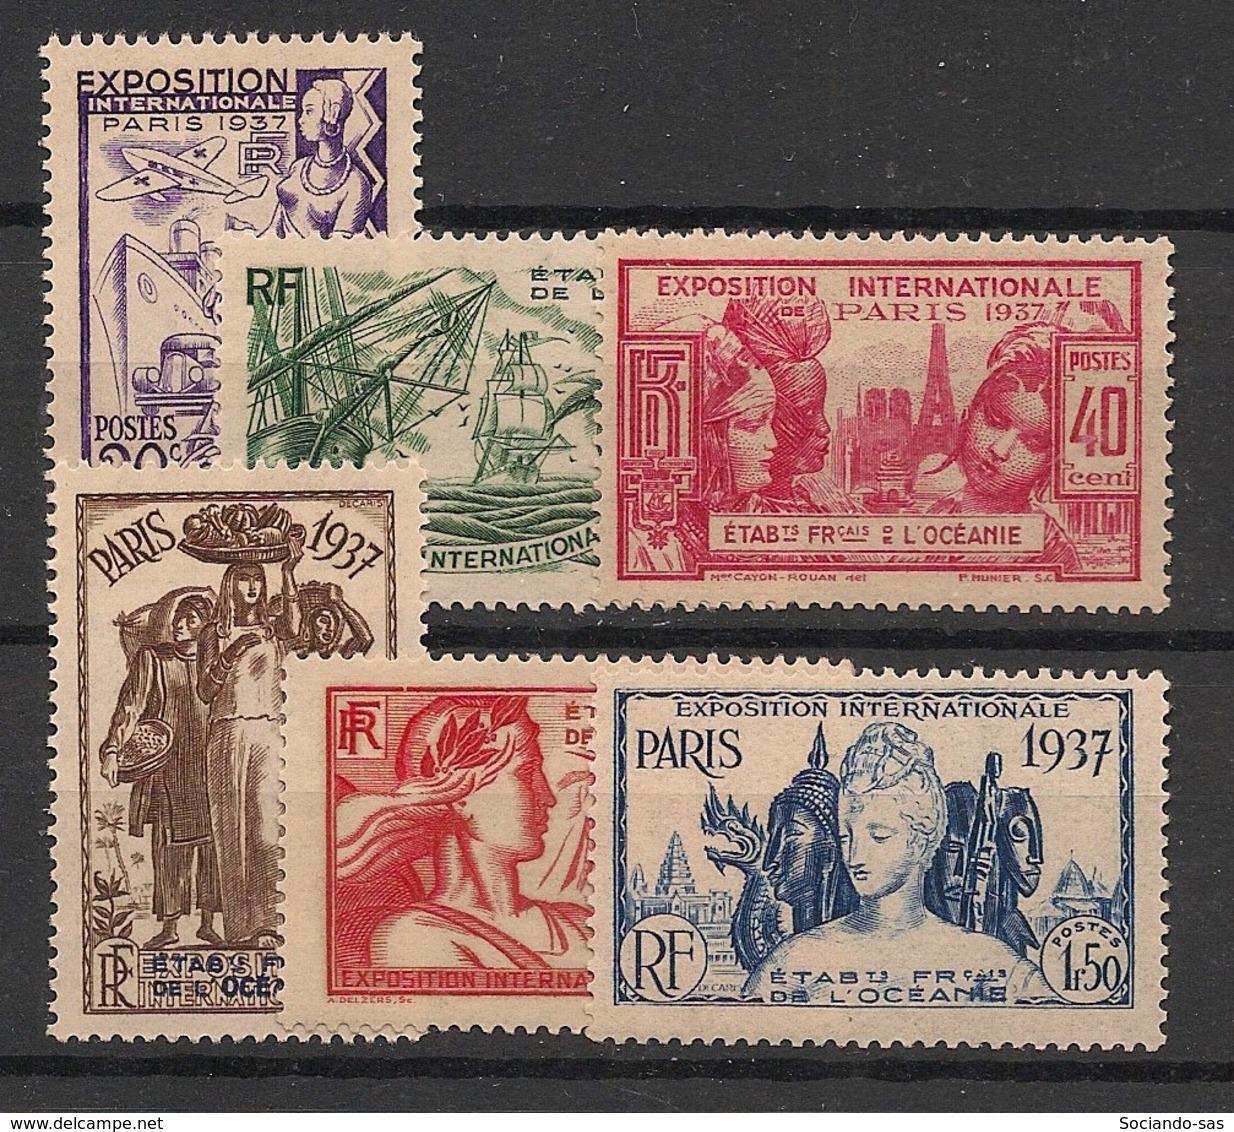 Océanie - 1937 - N°Yv. 121 à 126 - Série Complète - Exposition Internationale - Neuf Luxe ** / MNH / Postfrisch - Oceania (1892-1958)